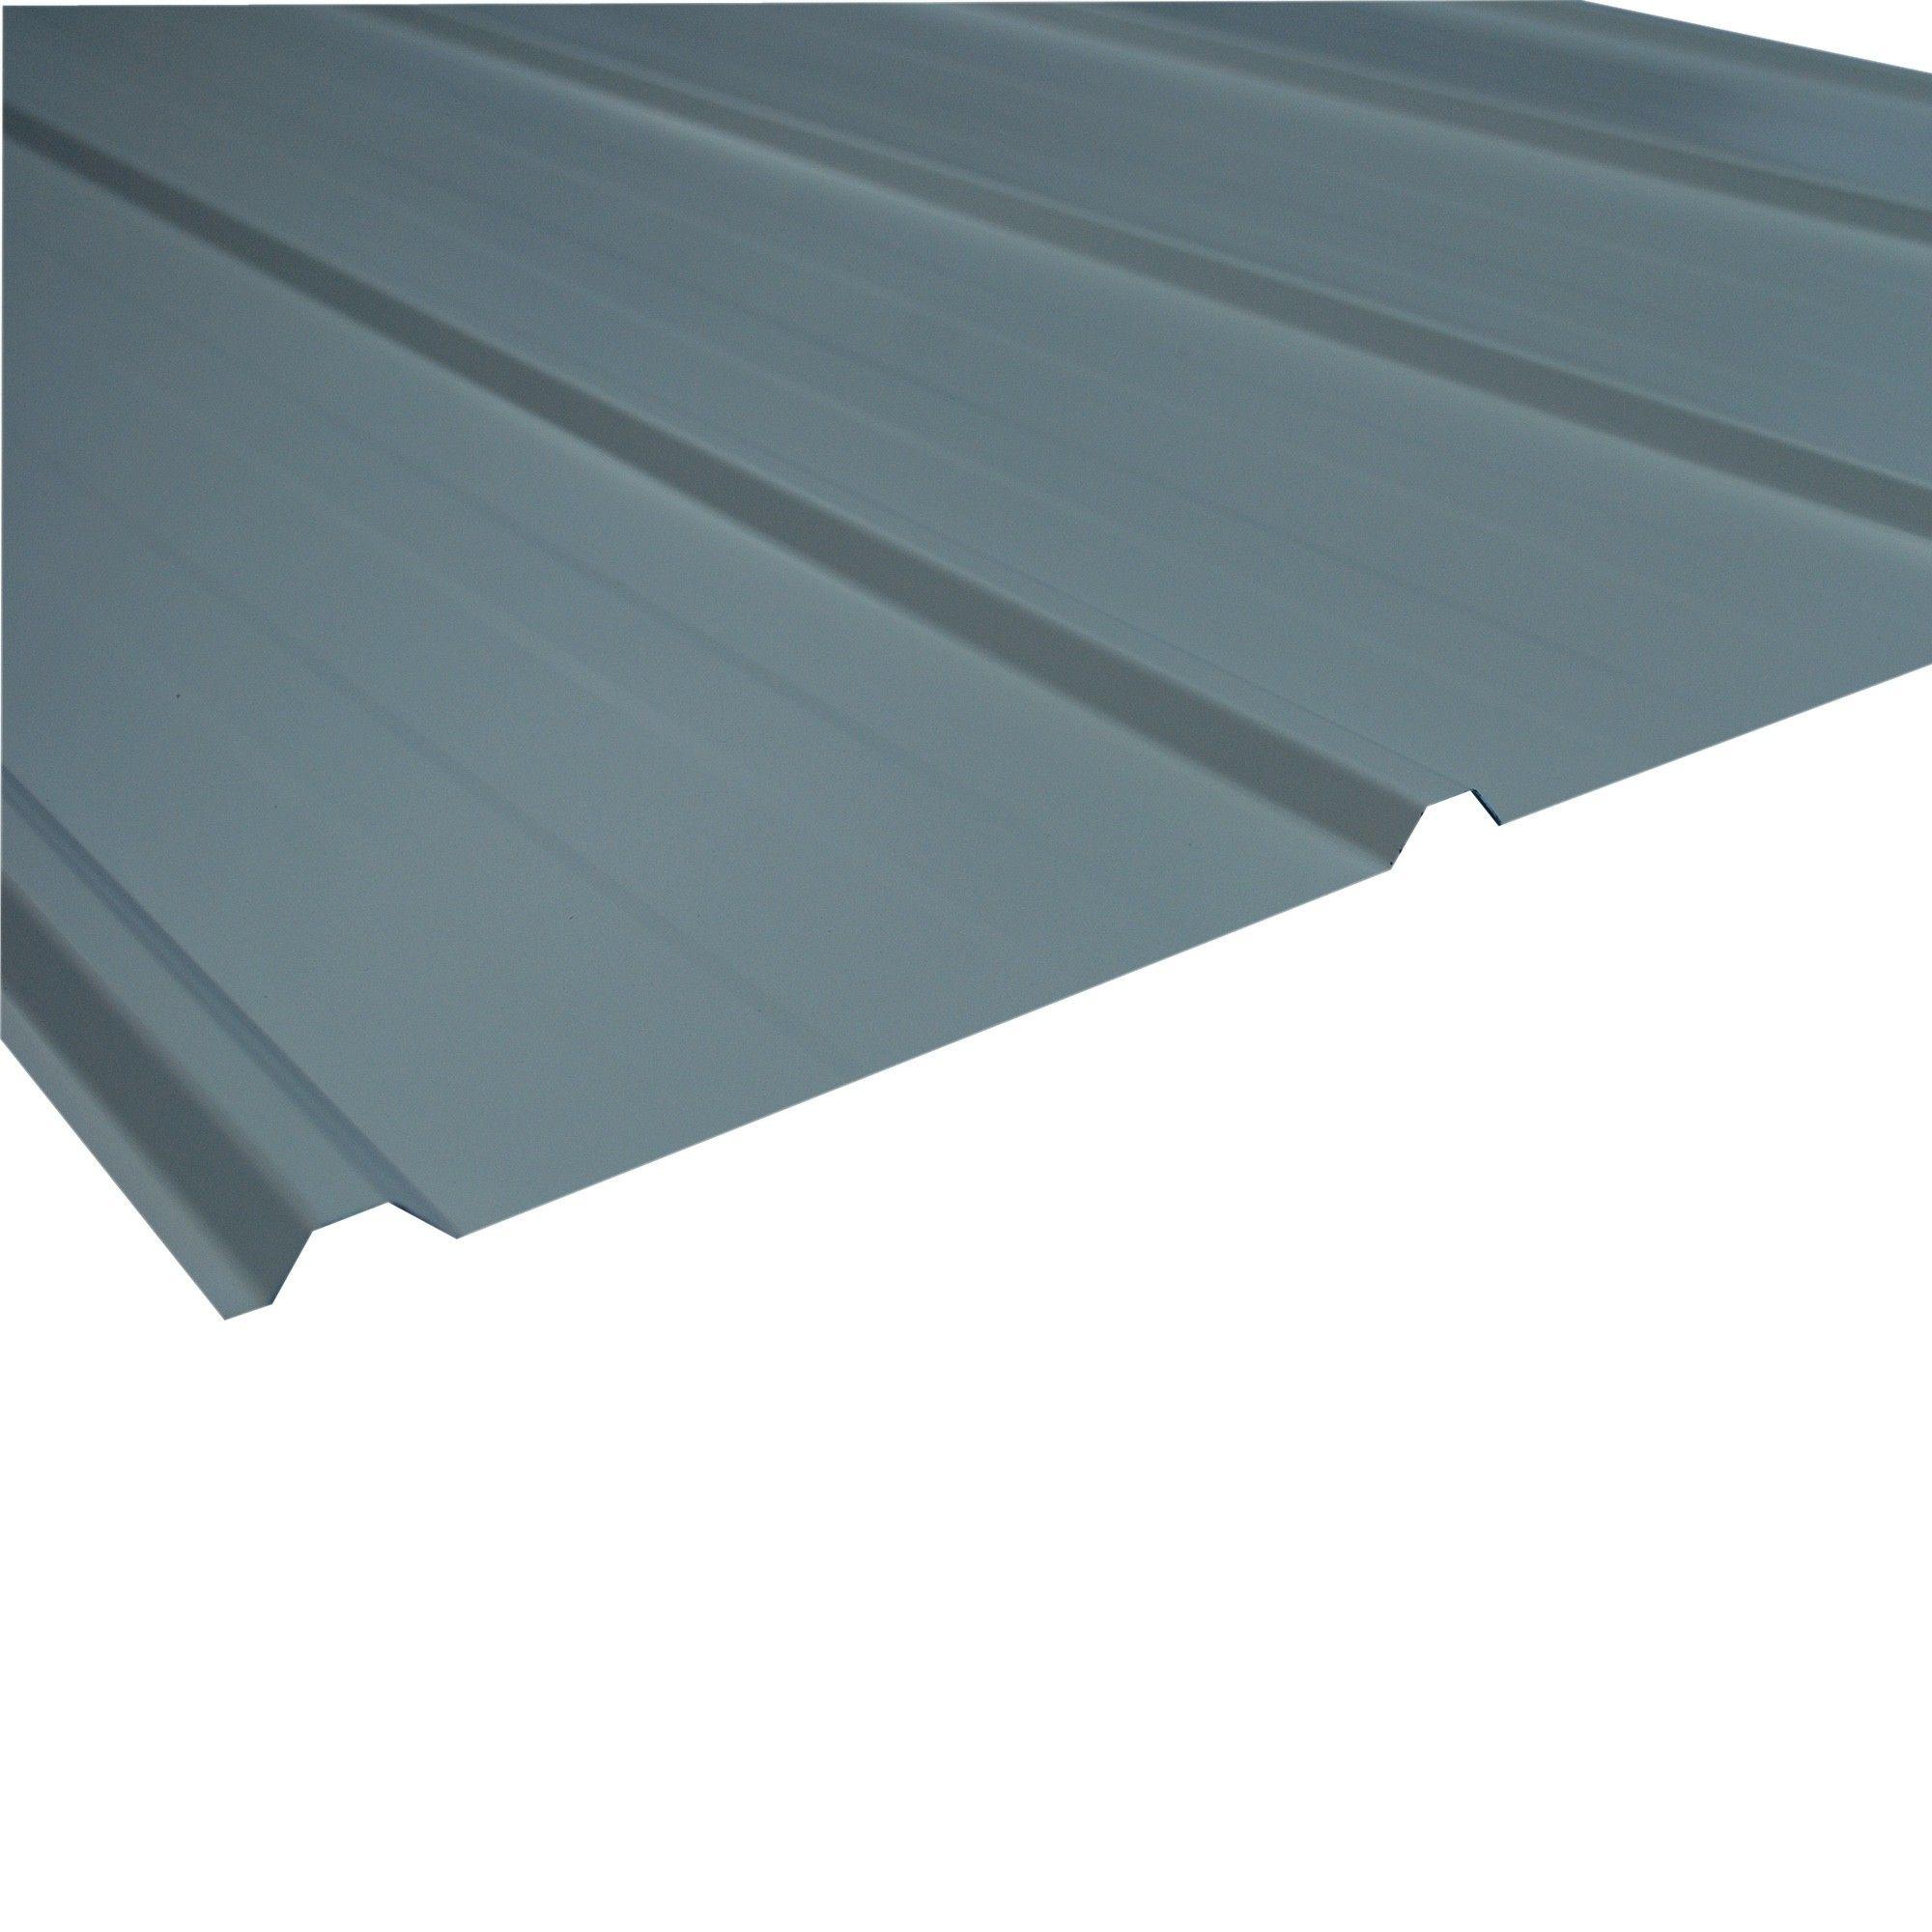 Multiclad Zincalume Metal Roofing Sheets Metal Roofing Online Wall Sheets Walling Sheet Metal Roofing